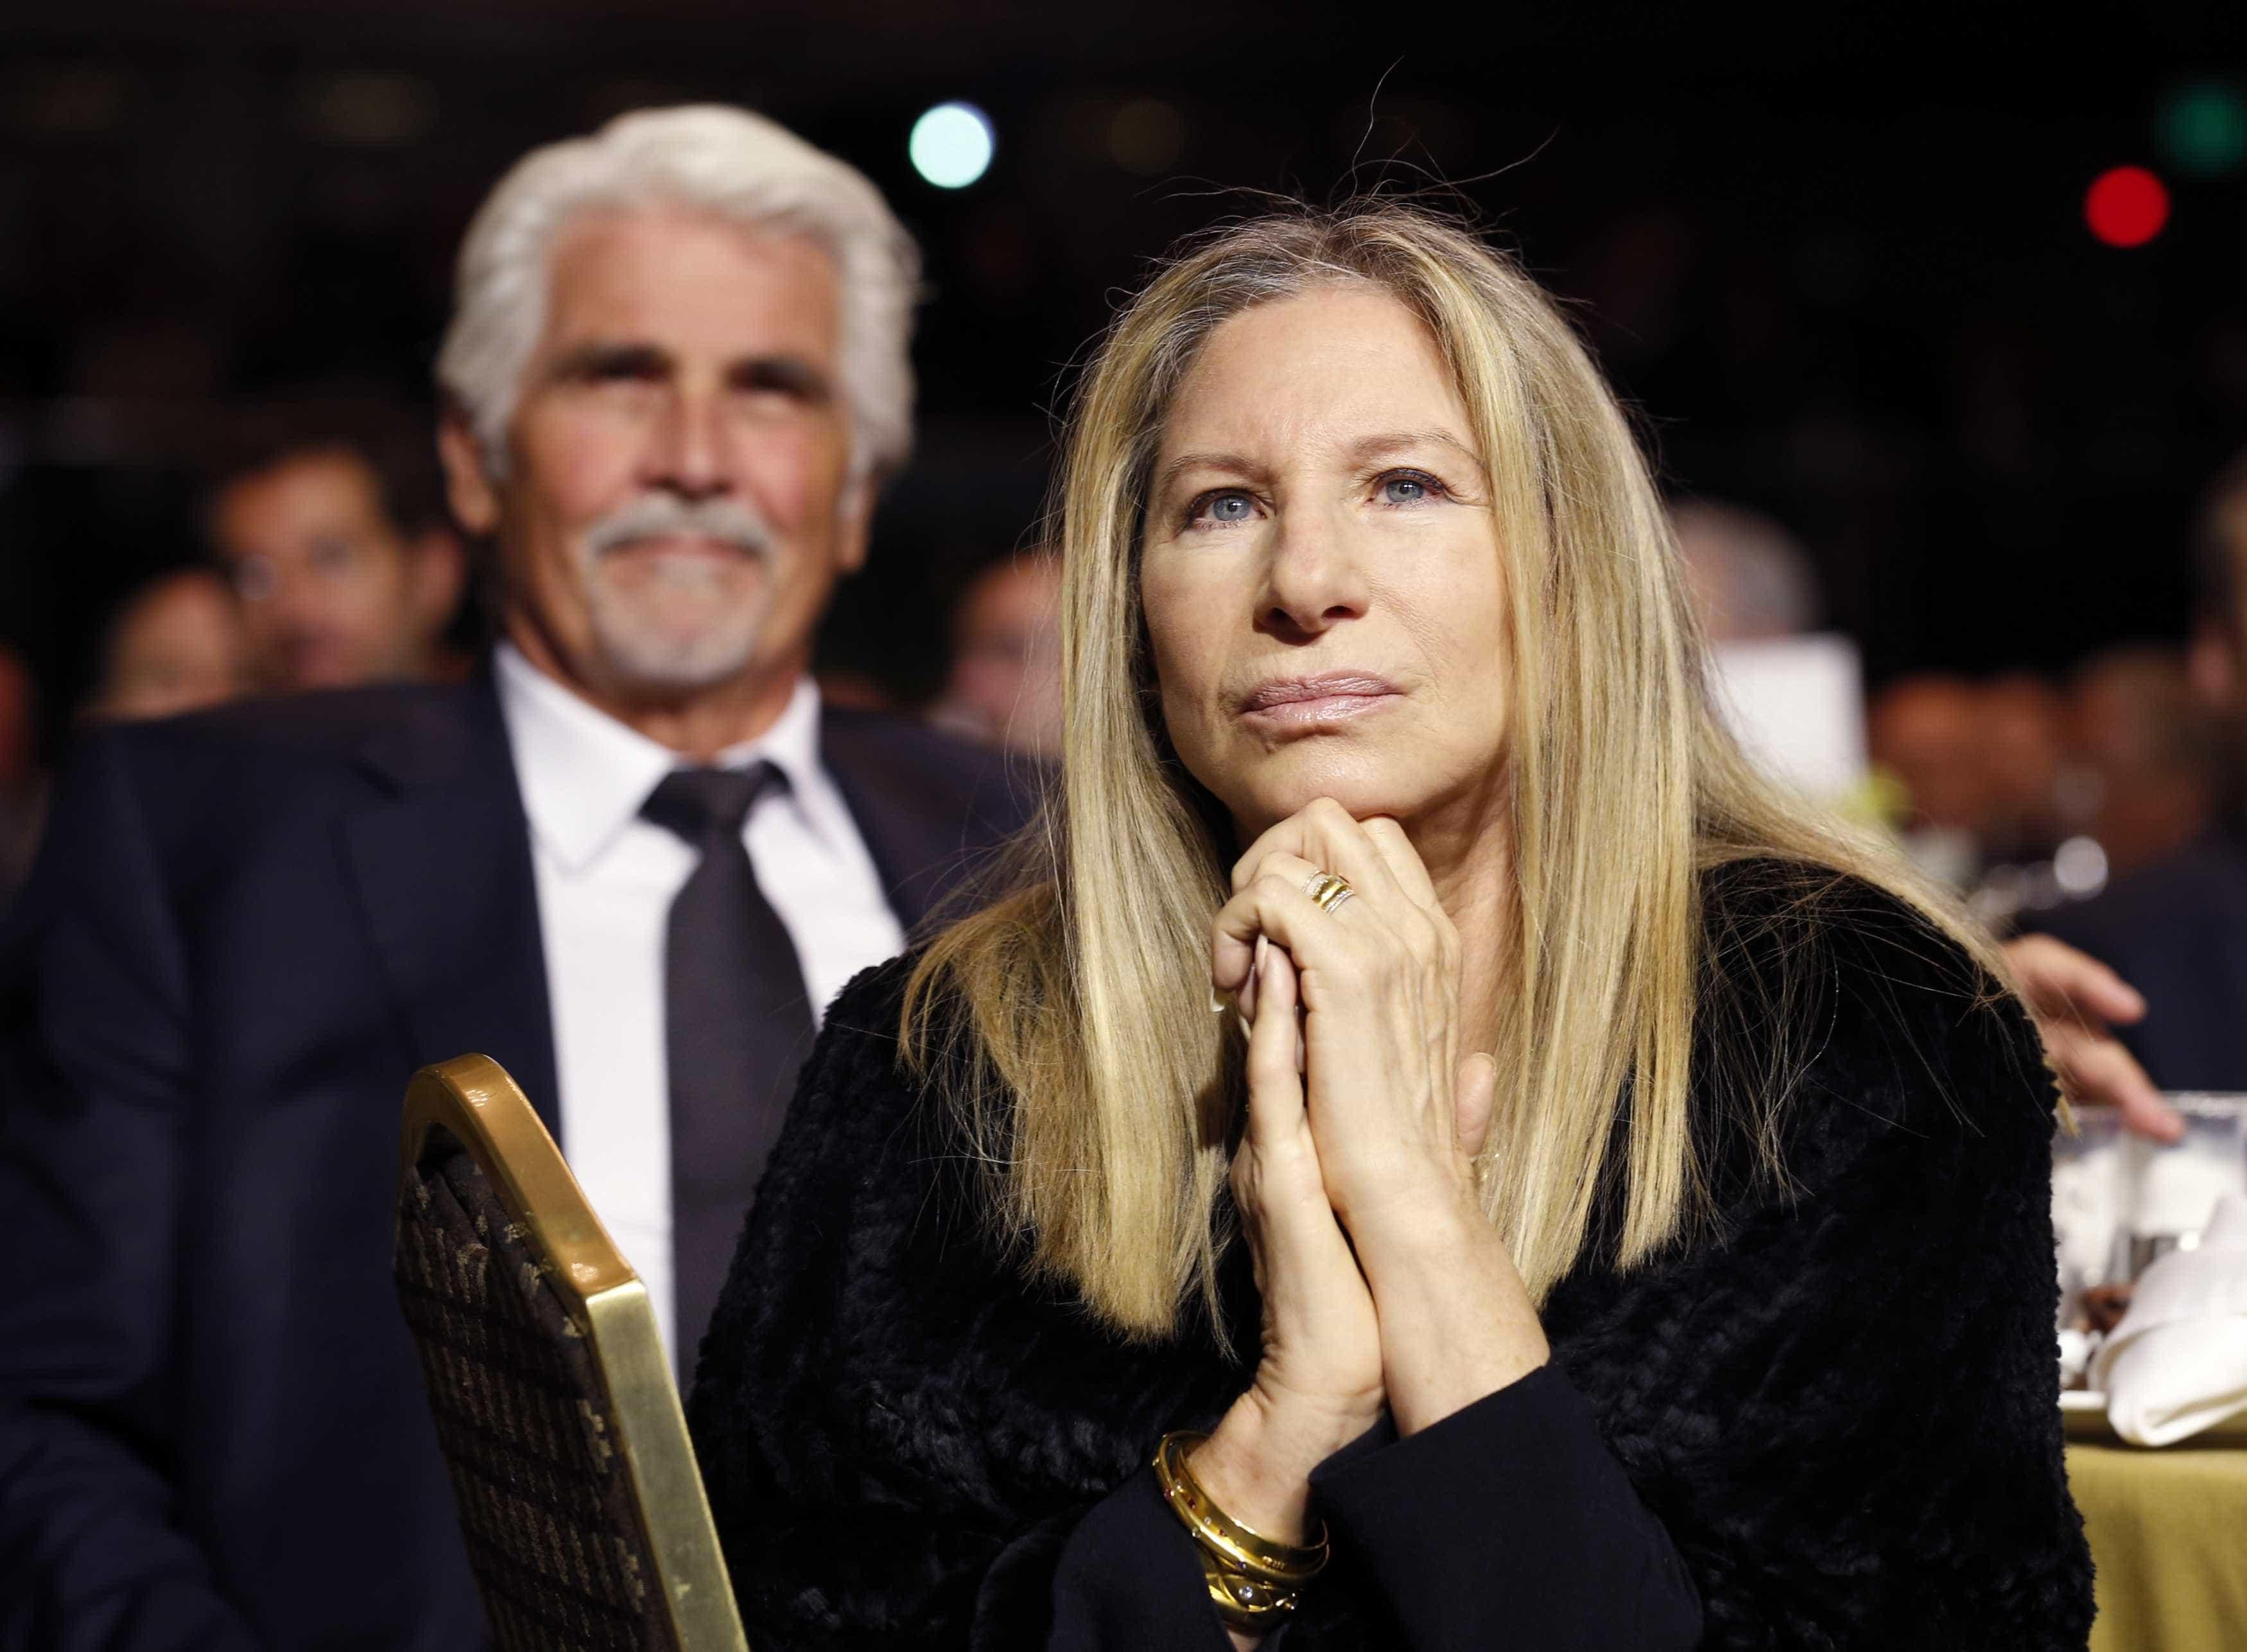 Barbra Streisand acredita nas vítimas de Michael Jackson mas culpa pais